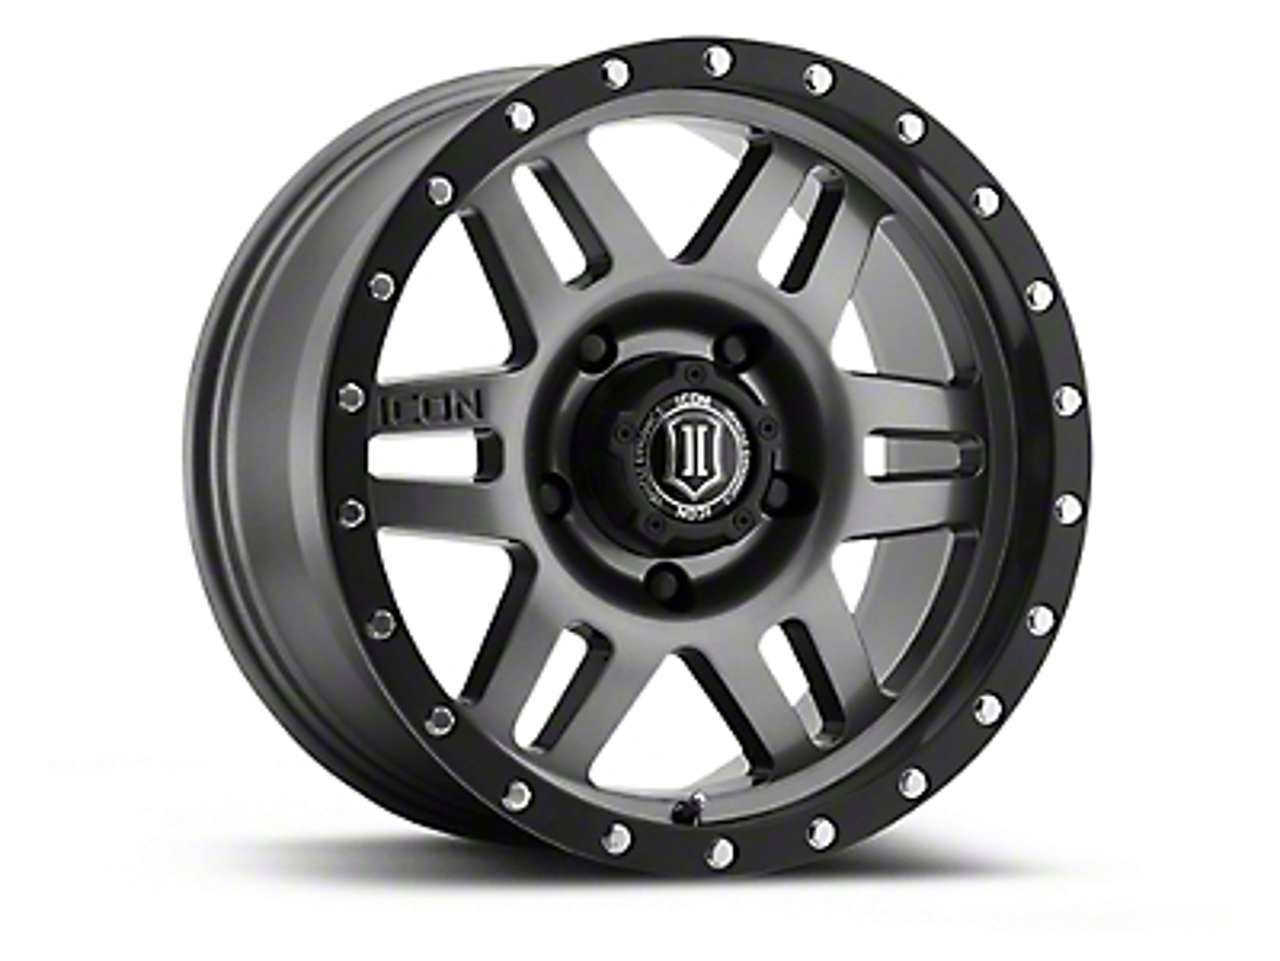 ICON Vehicle Dynamics Six Speed Gunmetal 6-Lug Wheel - 17x8.5 (04-17 All)